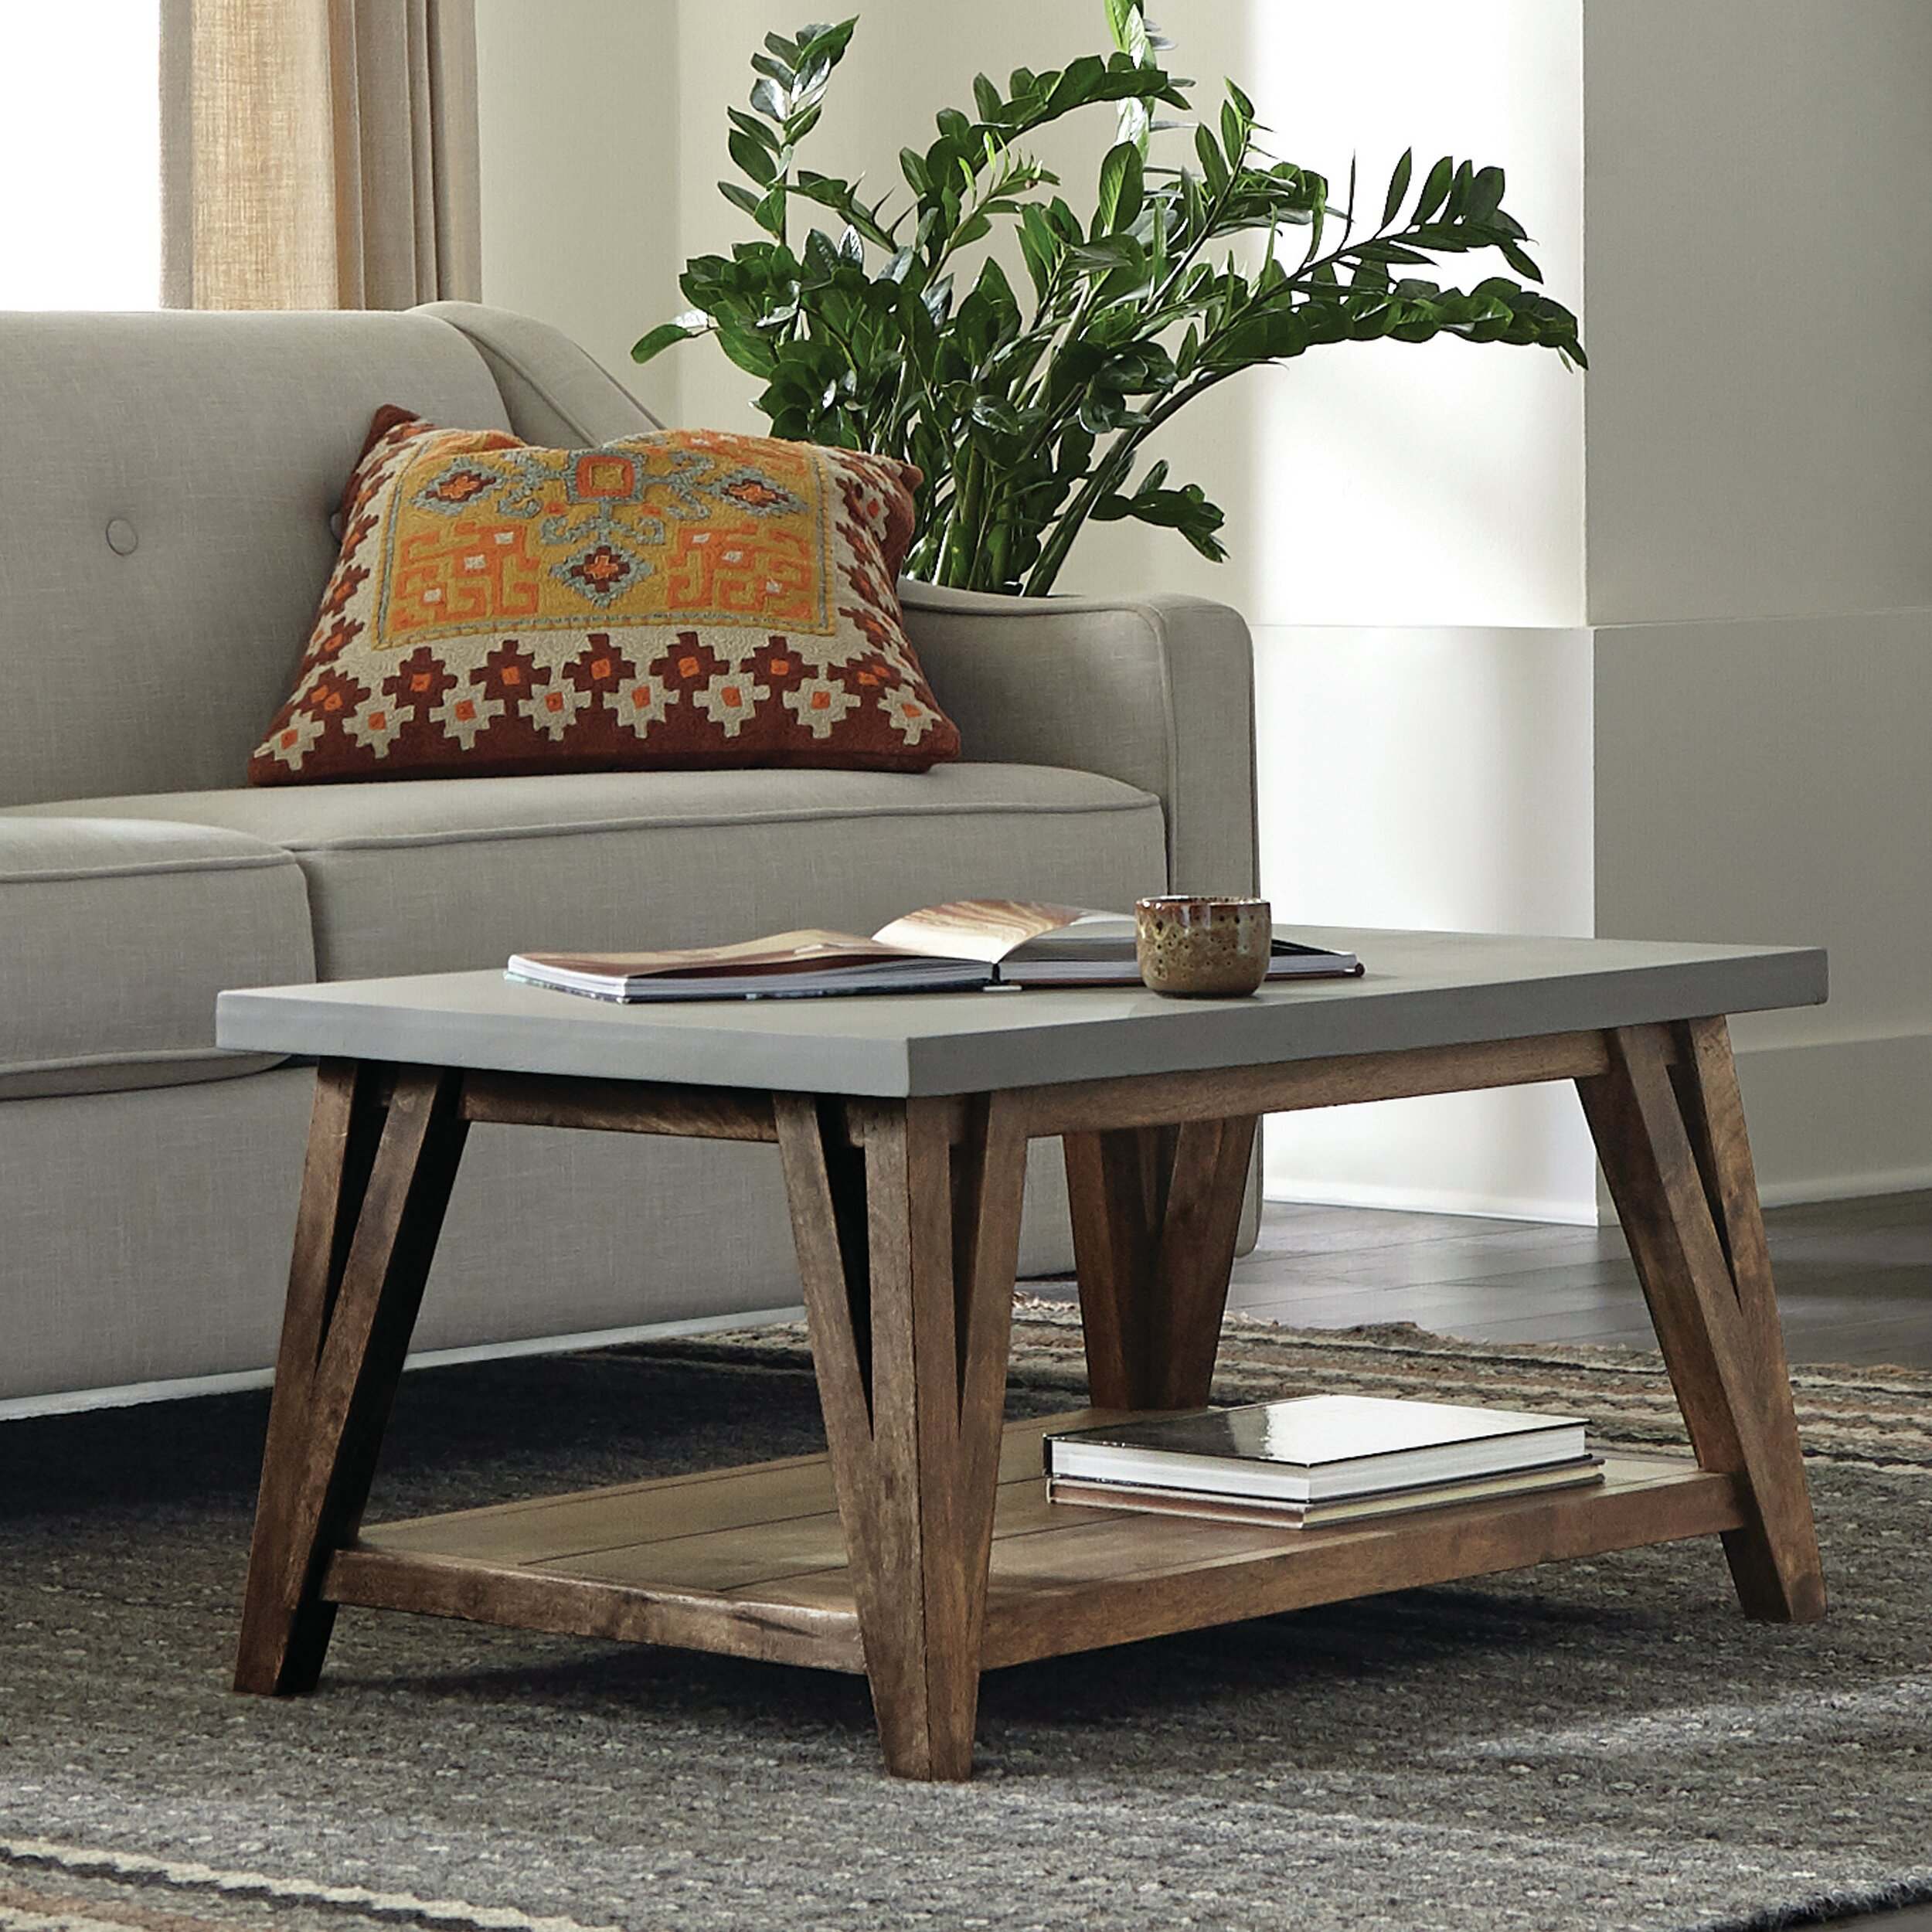 Modern Farmhouse Small Coffee Tables You Ll Love In 2021 Wayfair